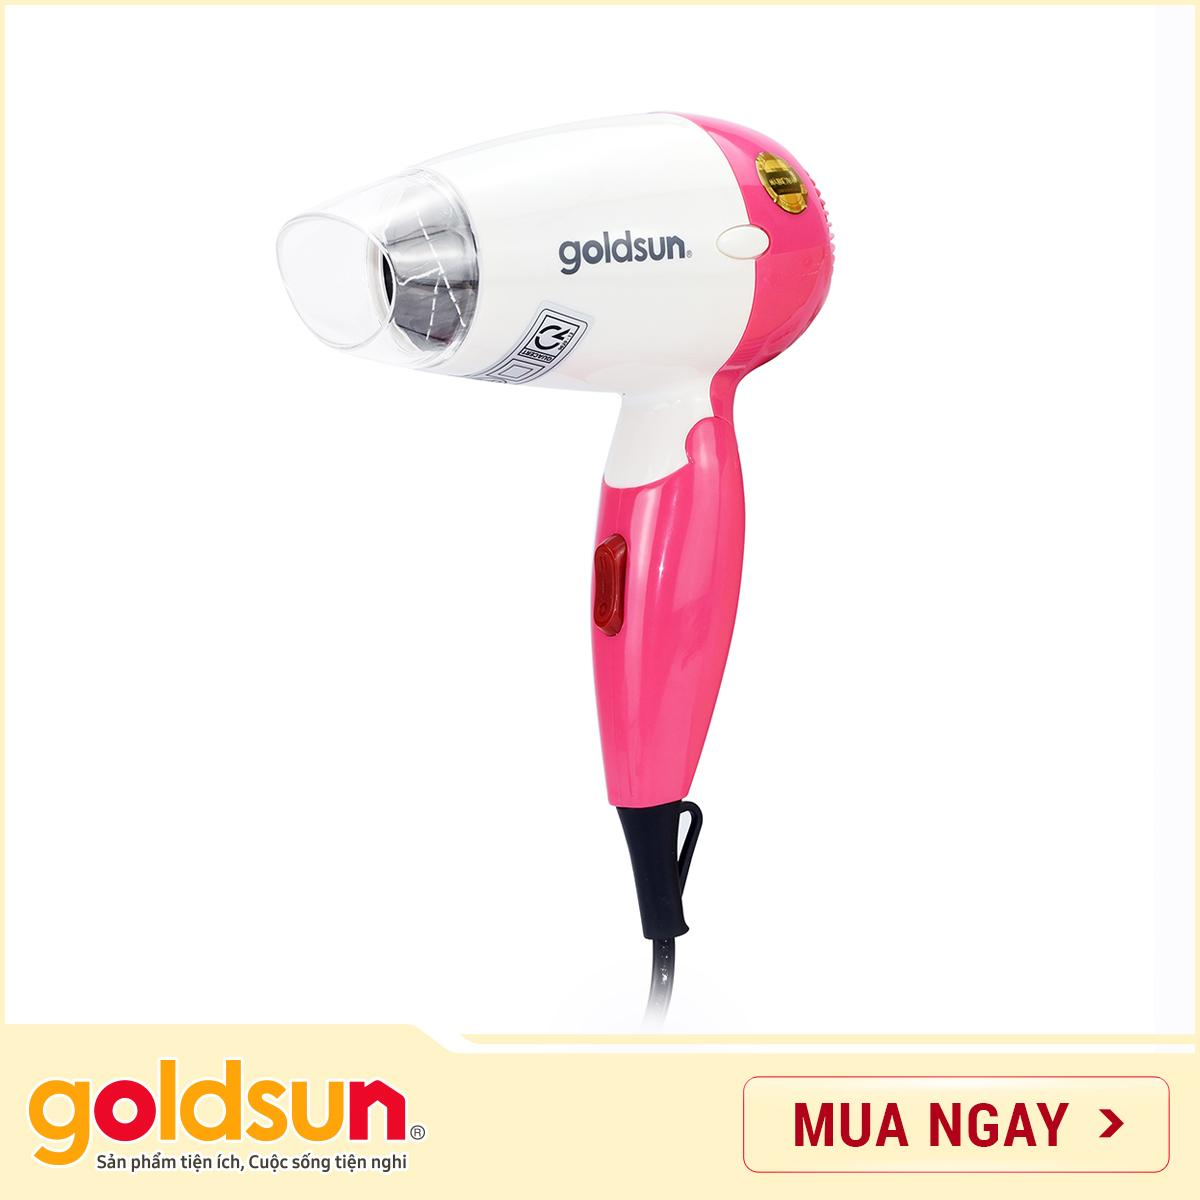 Máy sấy tóc Goldsun 650W HD-GXD850 (Hồng) cao cấp